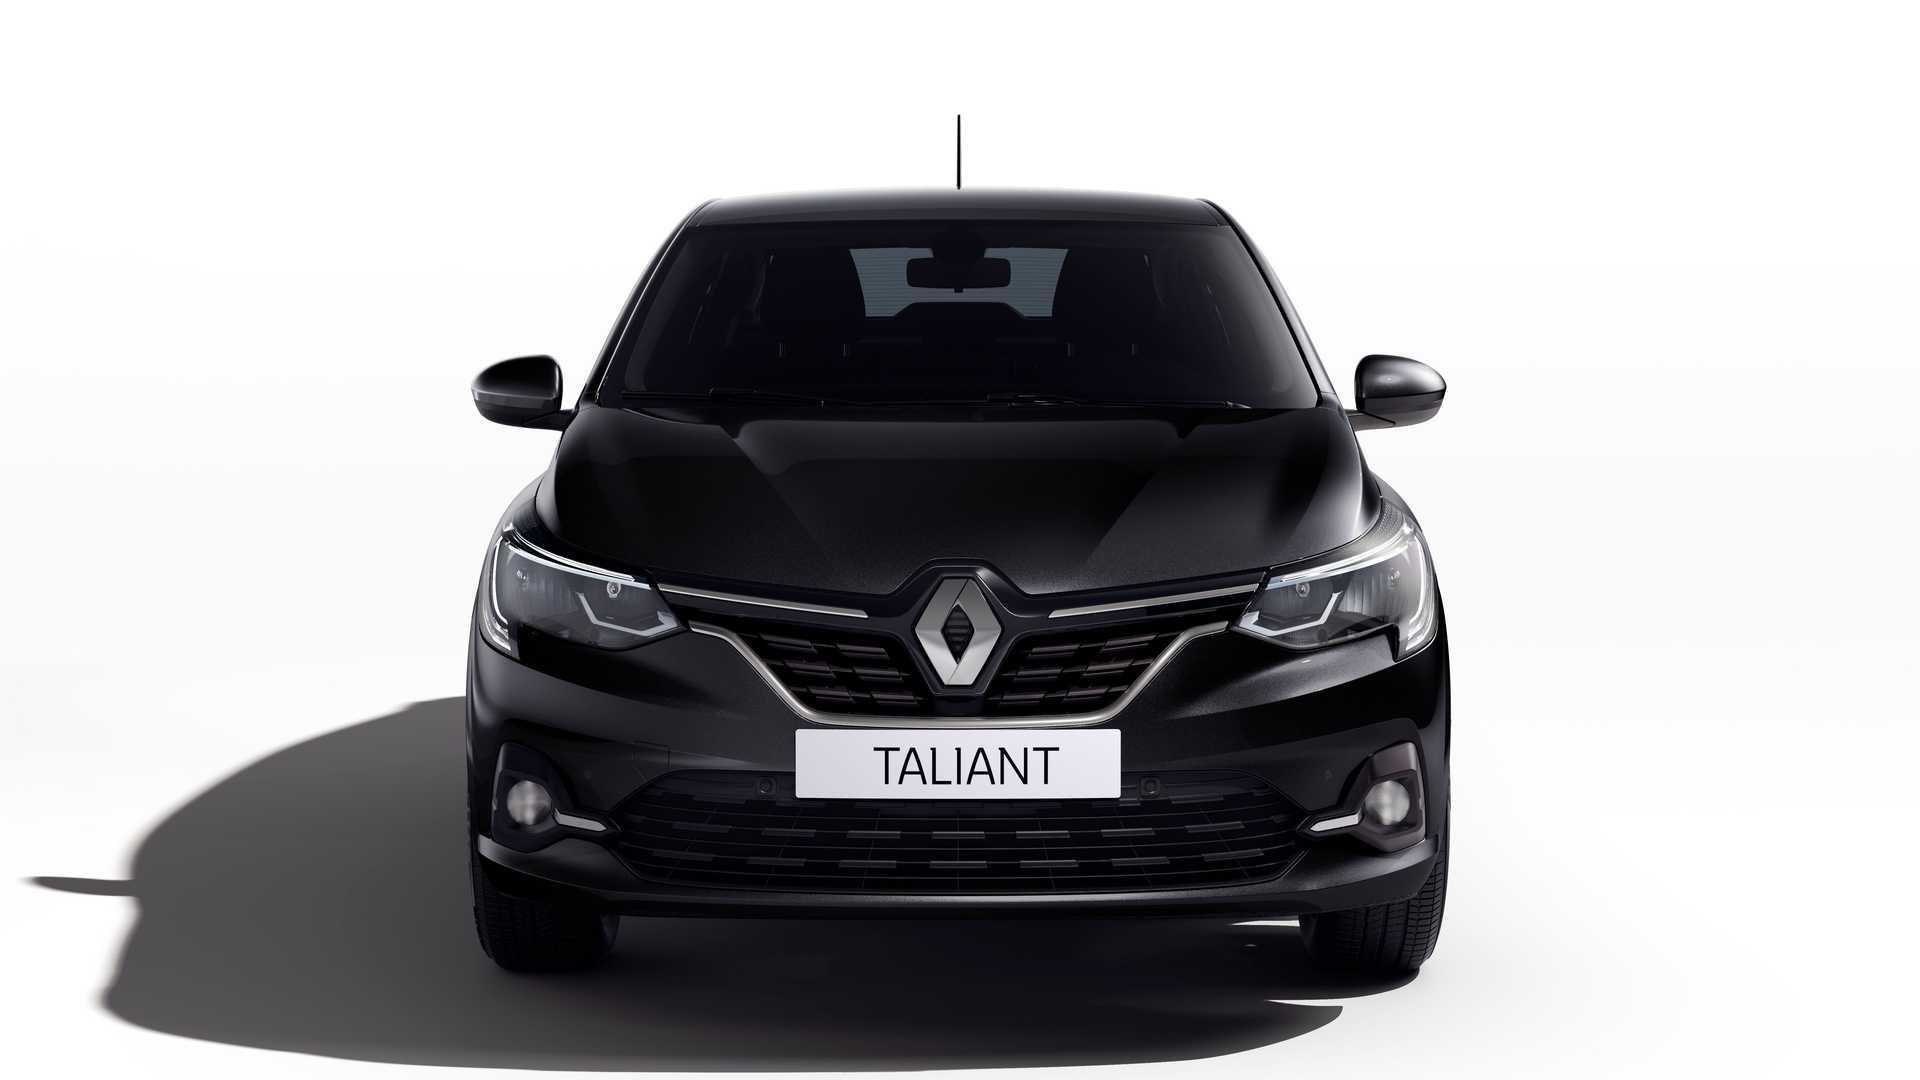 2021_Renault_Taliant-0000